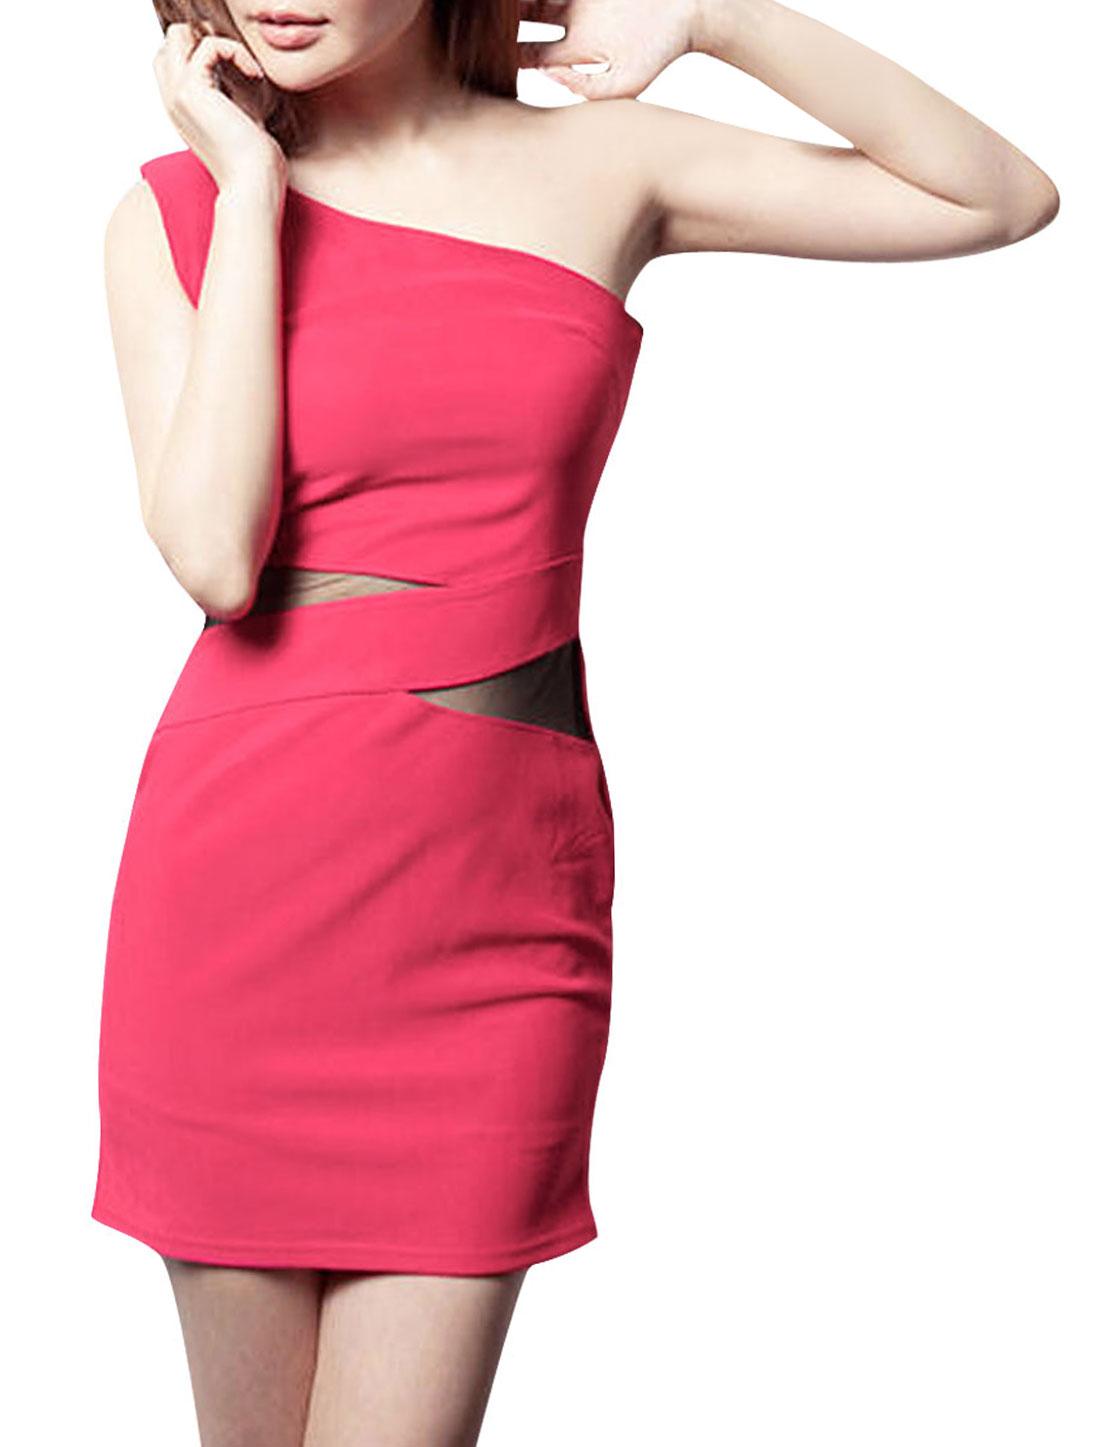 Women Fashional Fuchsia Color Semi-Sheer Mesh Panel Design Mini Dress XS